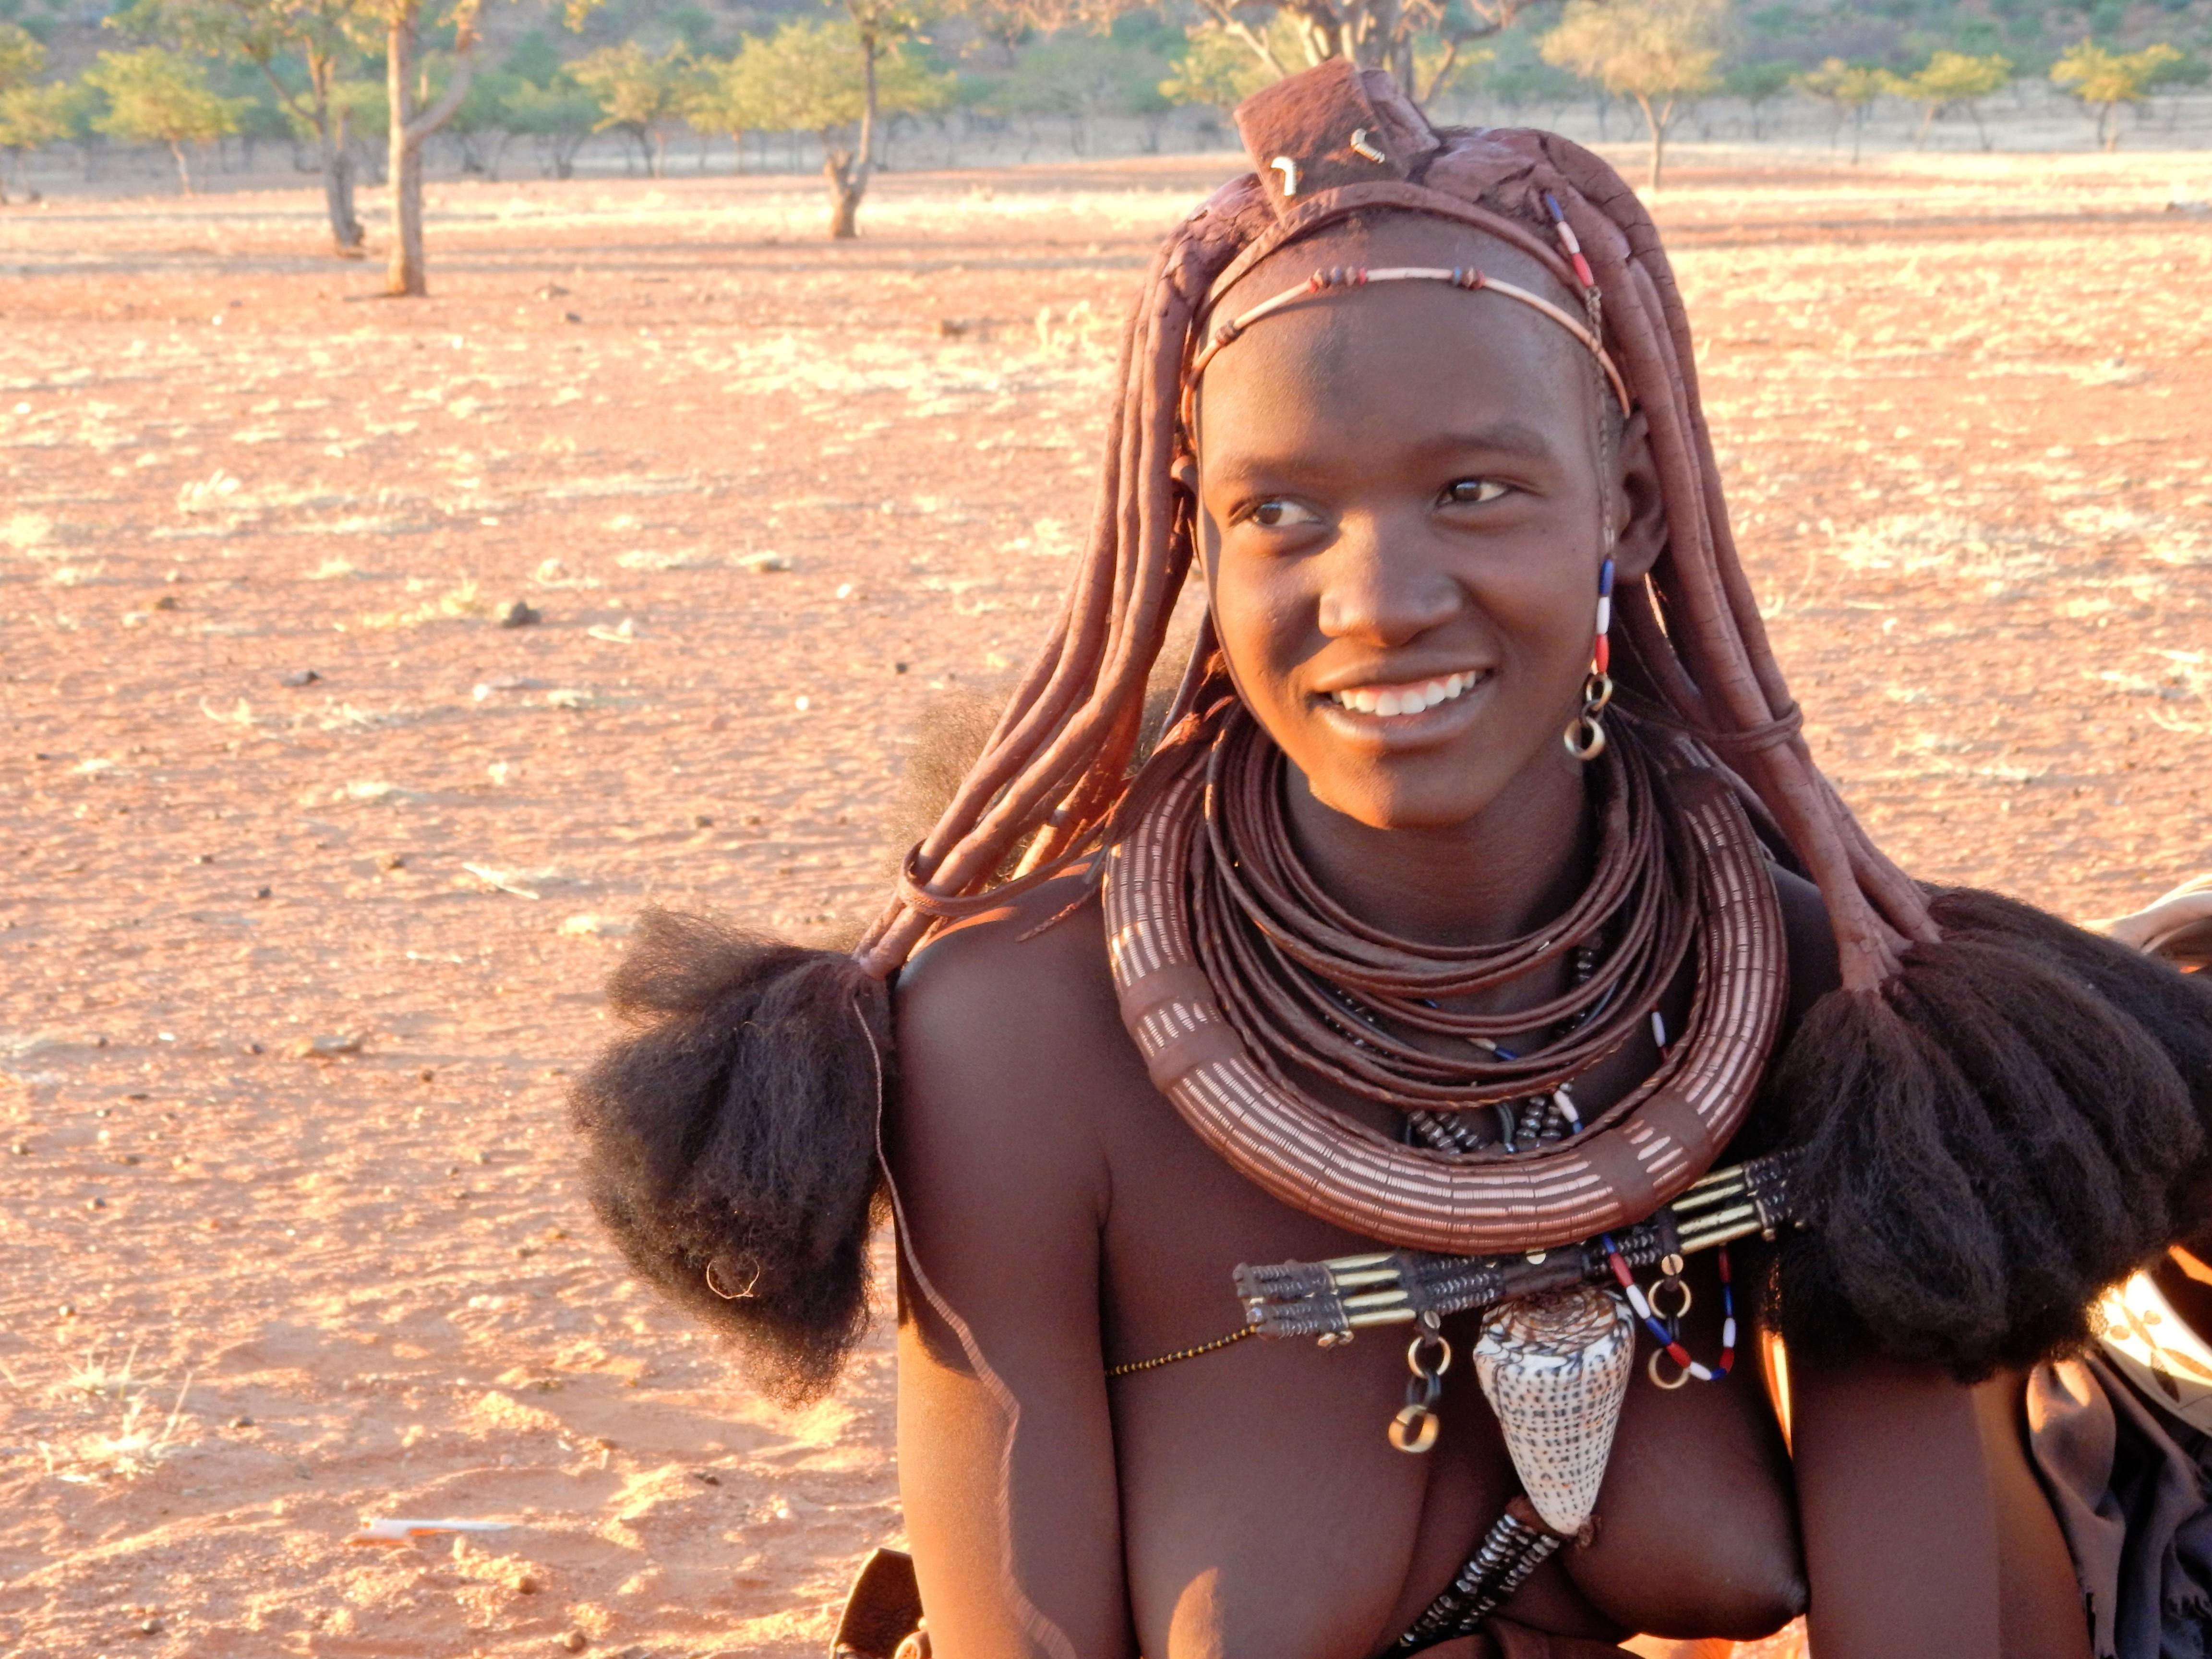 DSCN1293 Visite dun village Himba